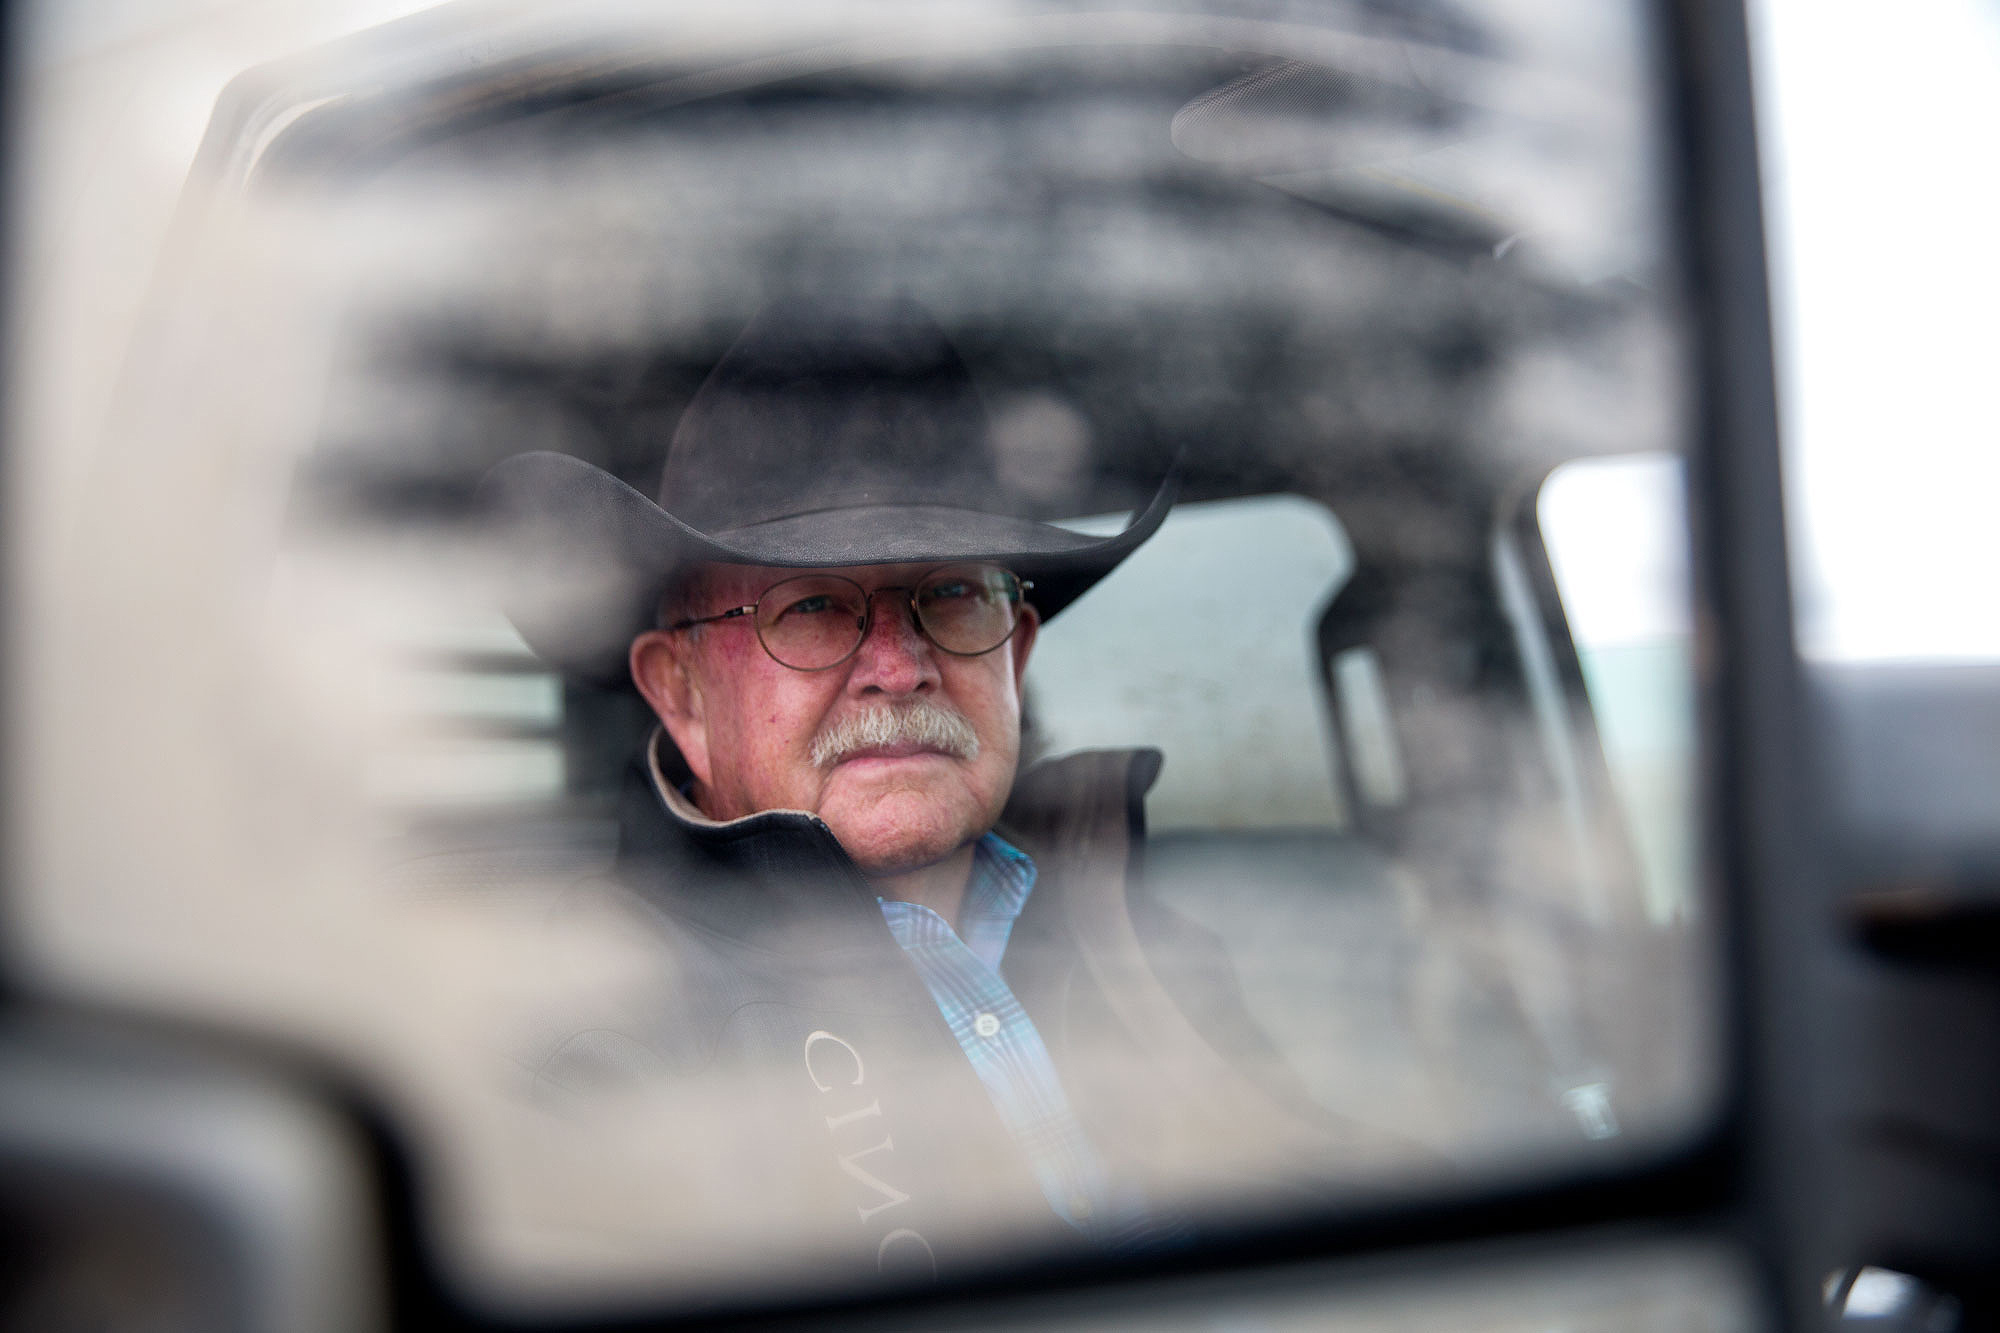 Photo: Terry Swanson Rancher Farmer Walsh HV1 191221